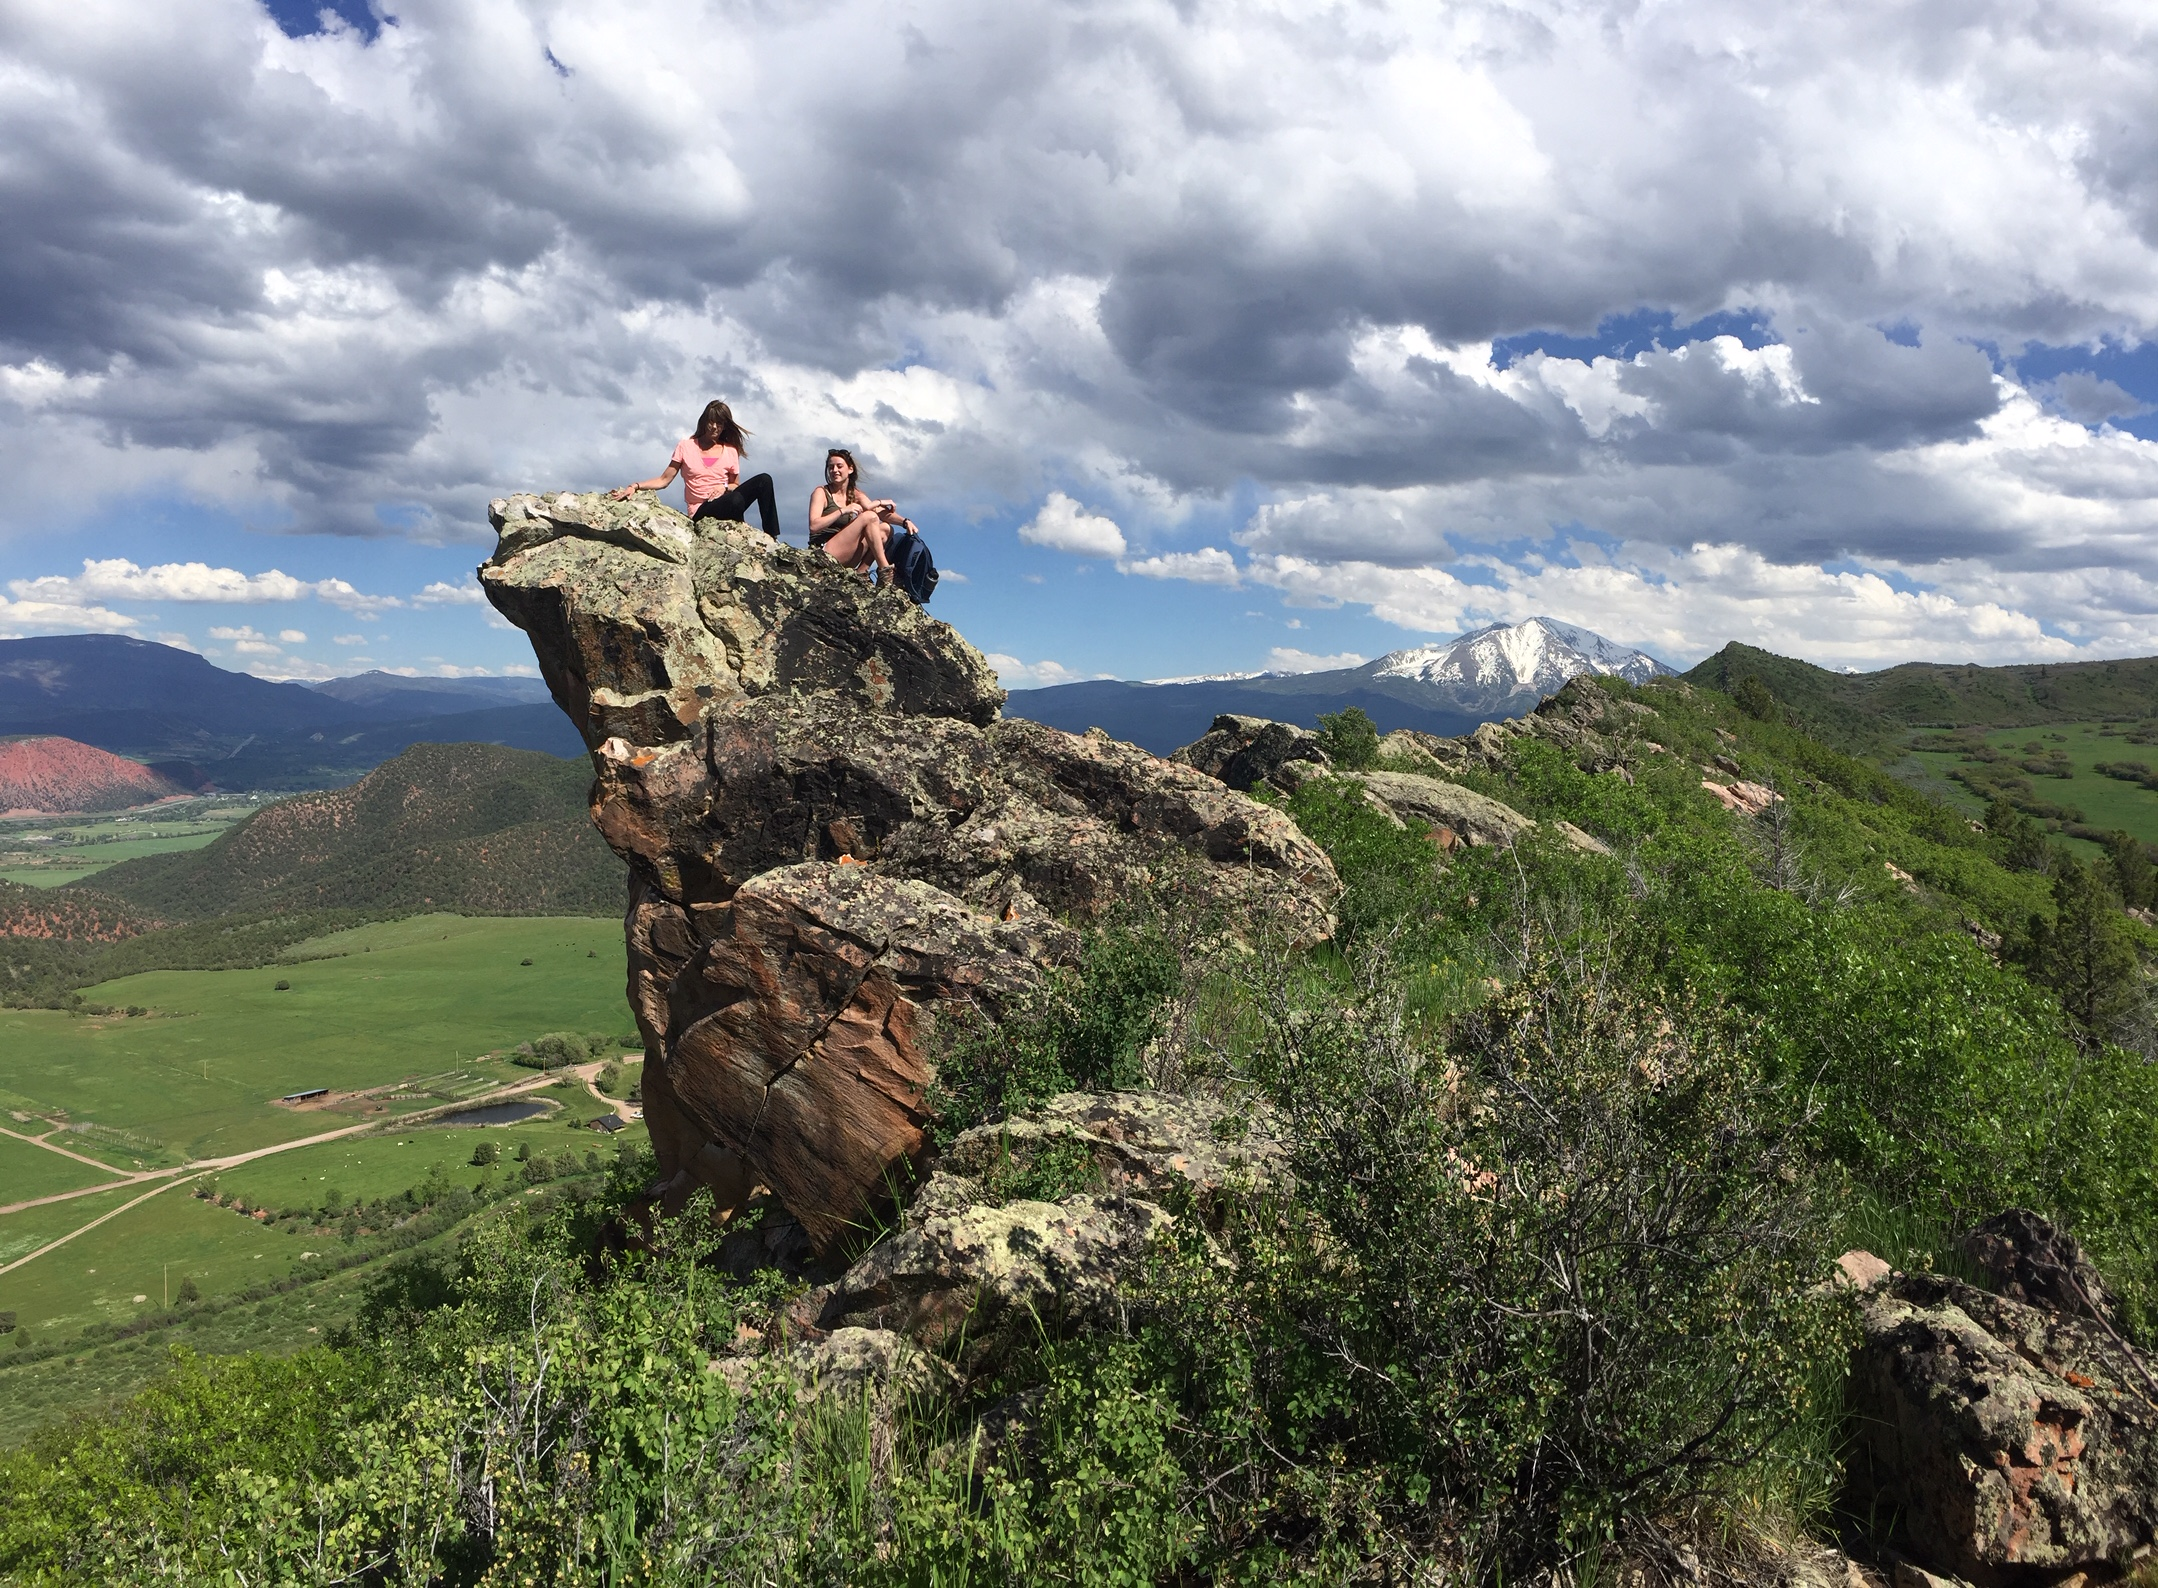 4Winds Farm - Women's Holistic Wellness and Healing Retreat in Colorado